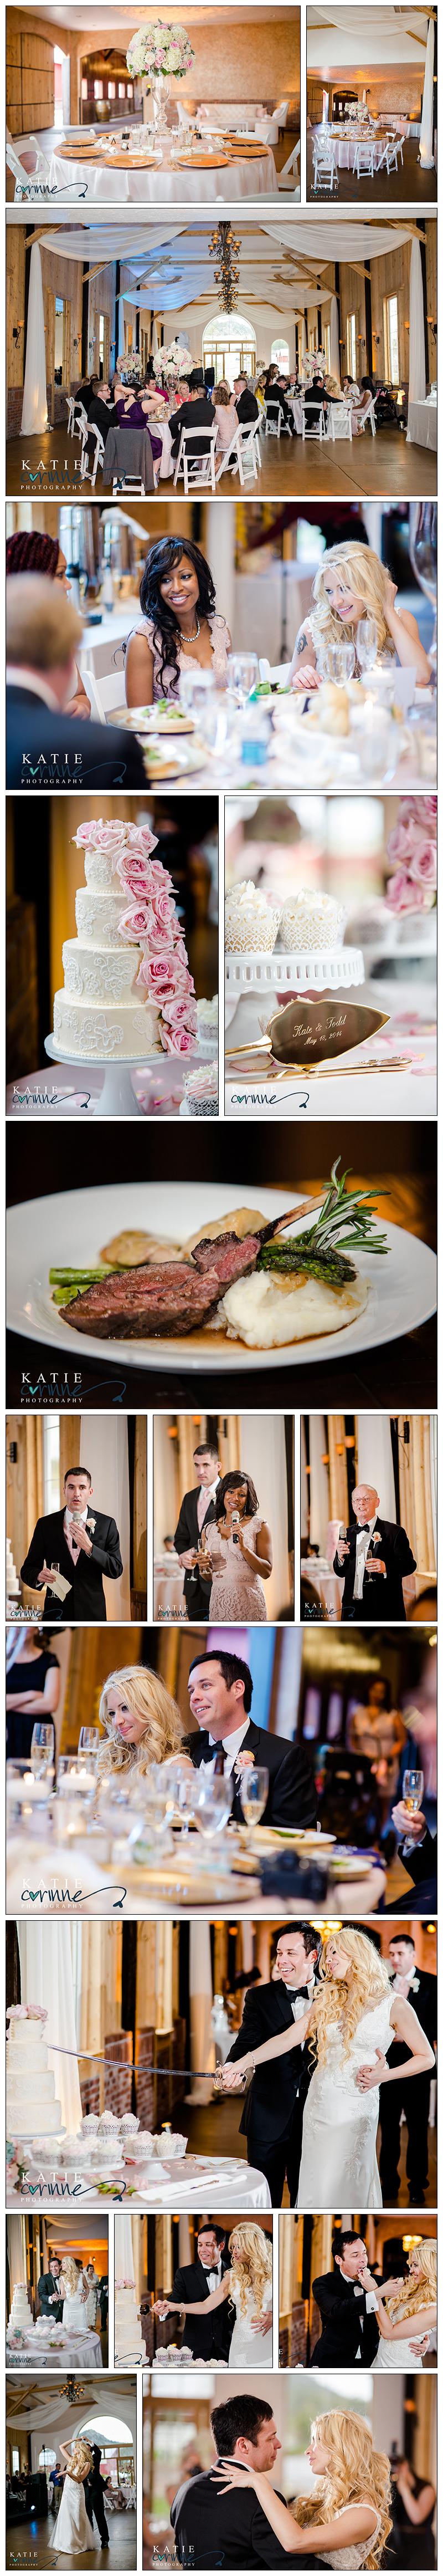 Great wedding photography of food, Wonderful wedding photography of flowers, bouquets and dresses